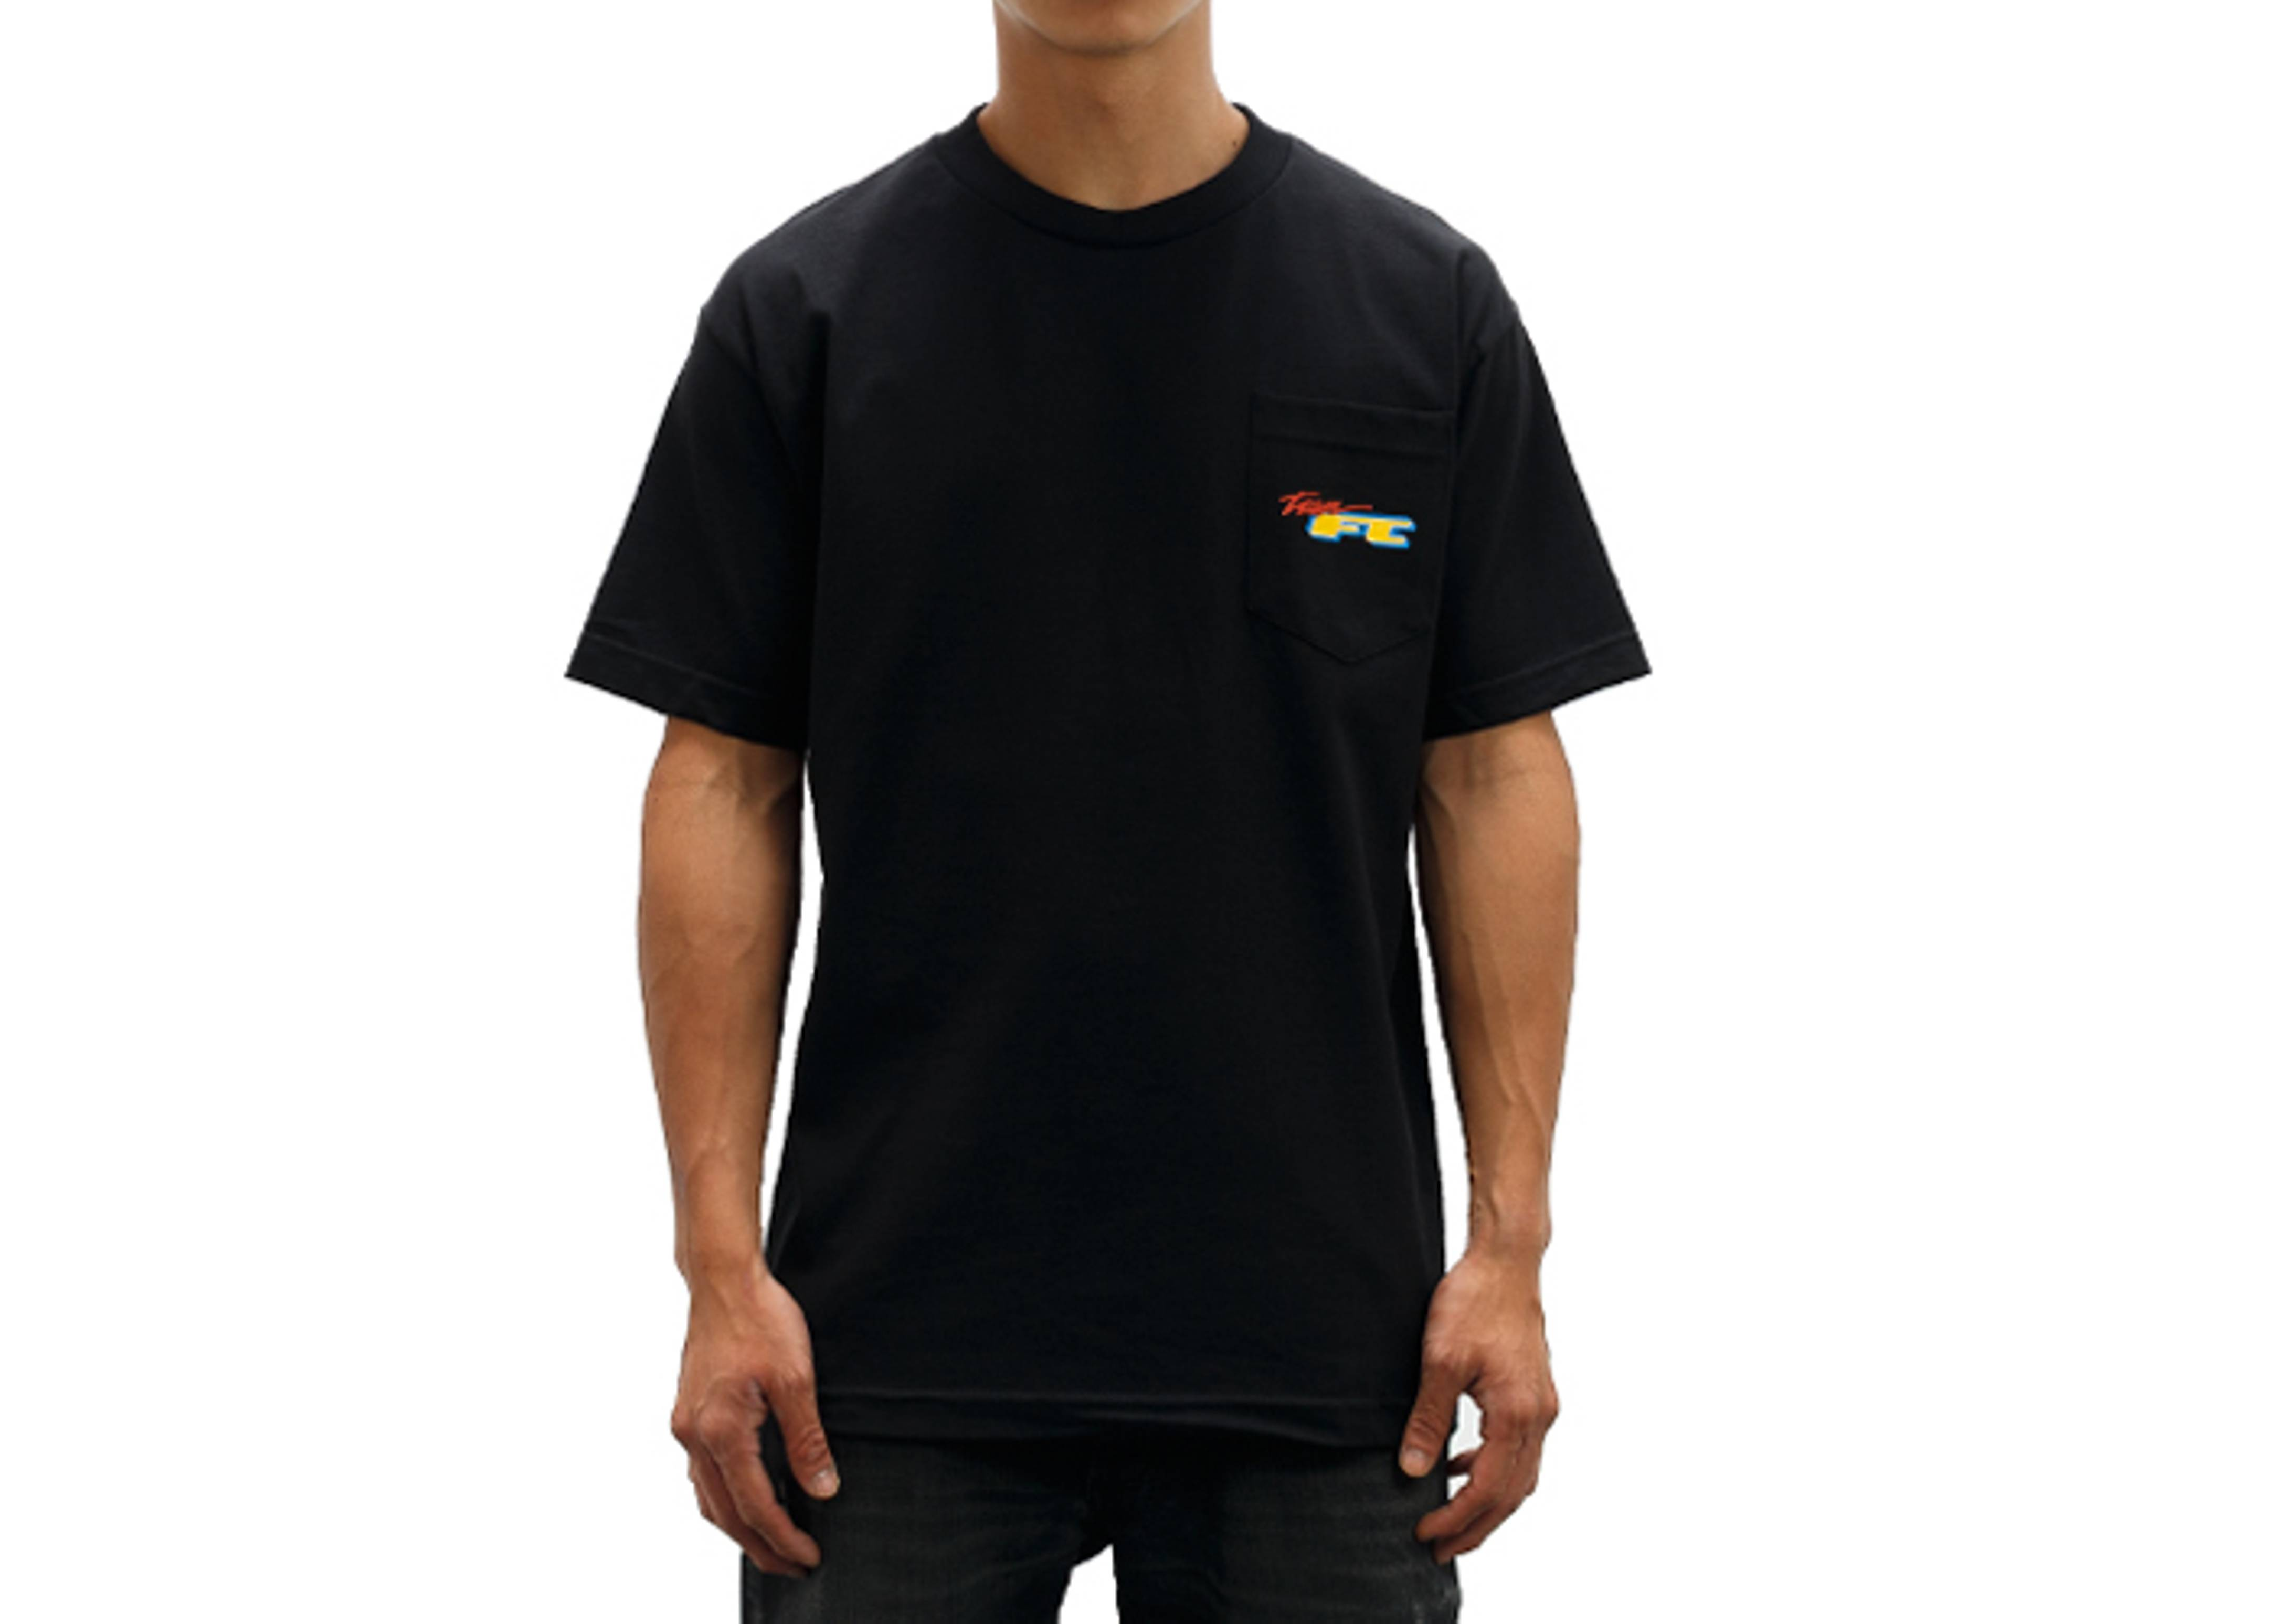 team fc t-shirt